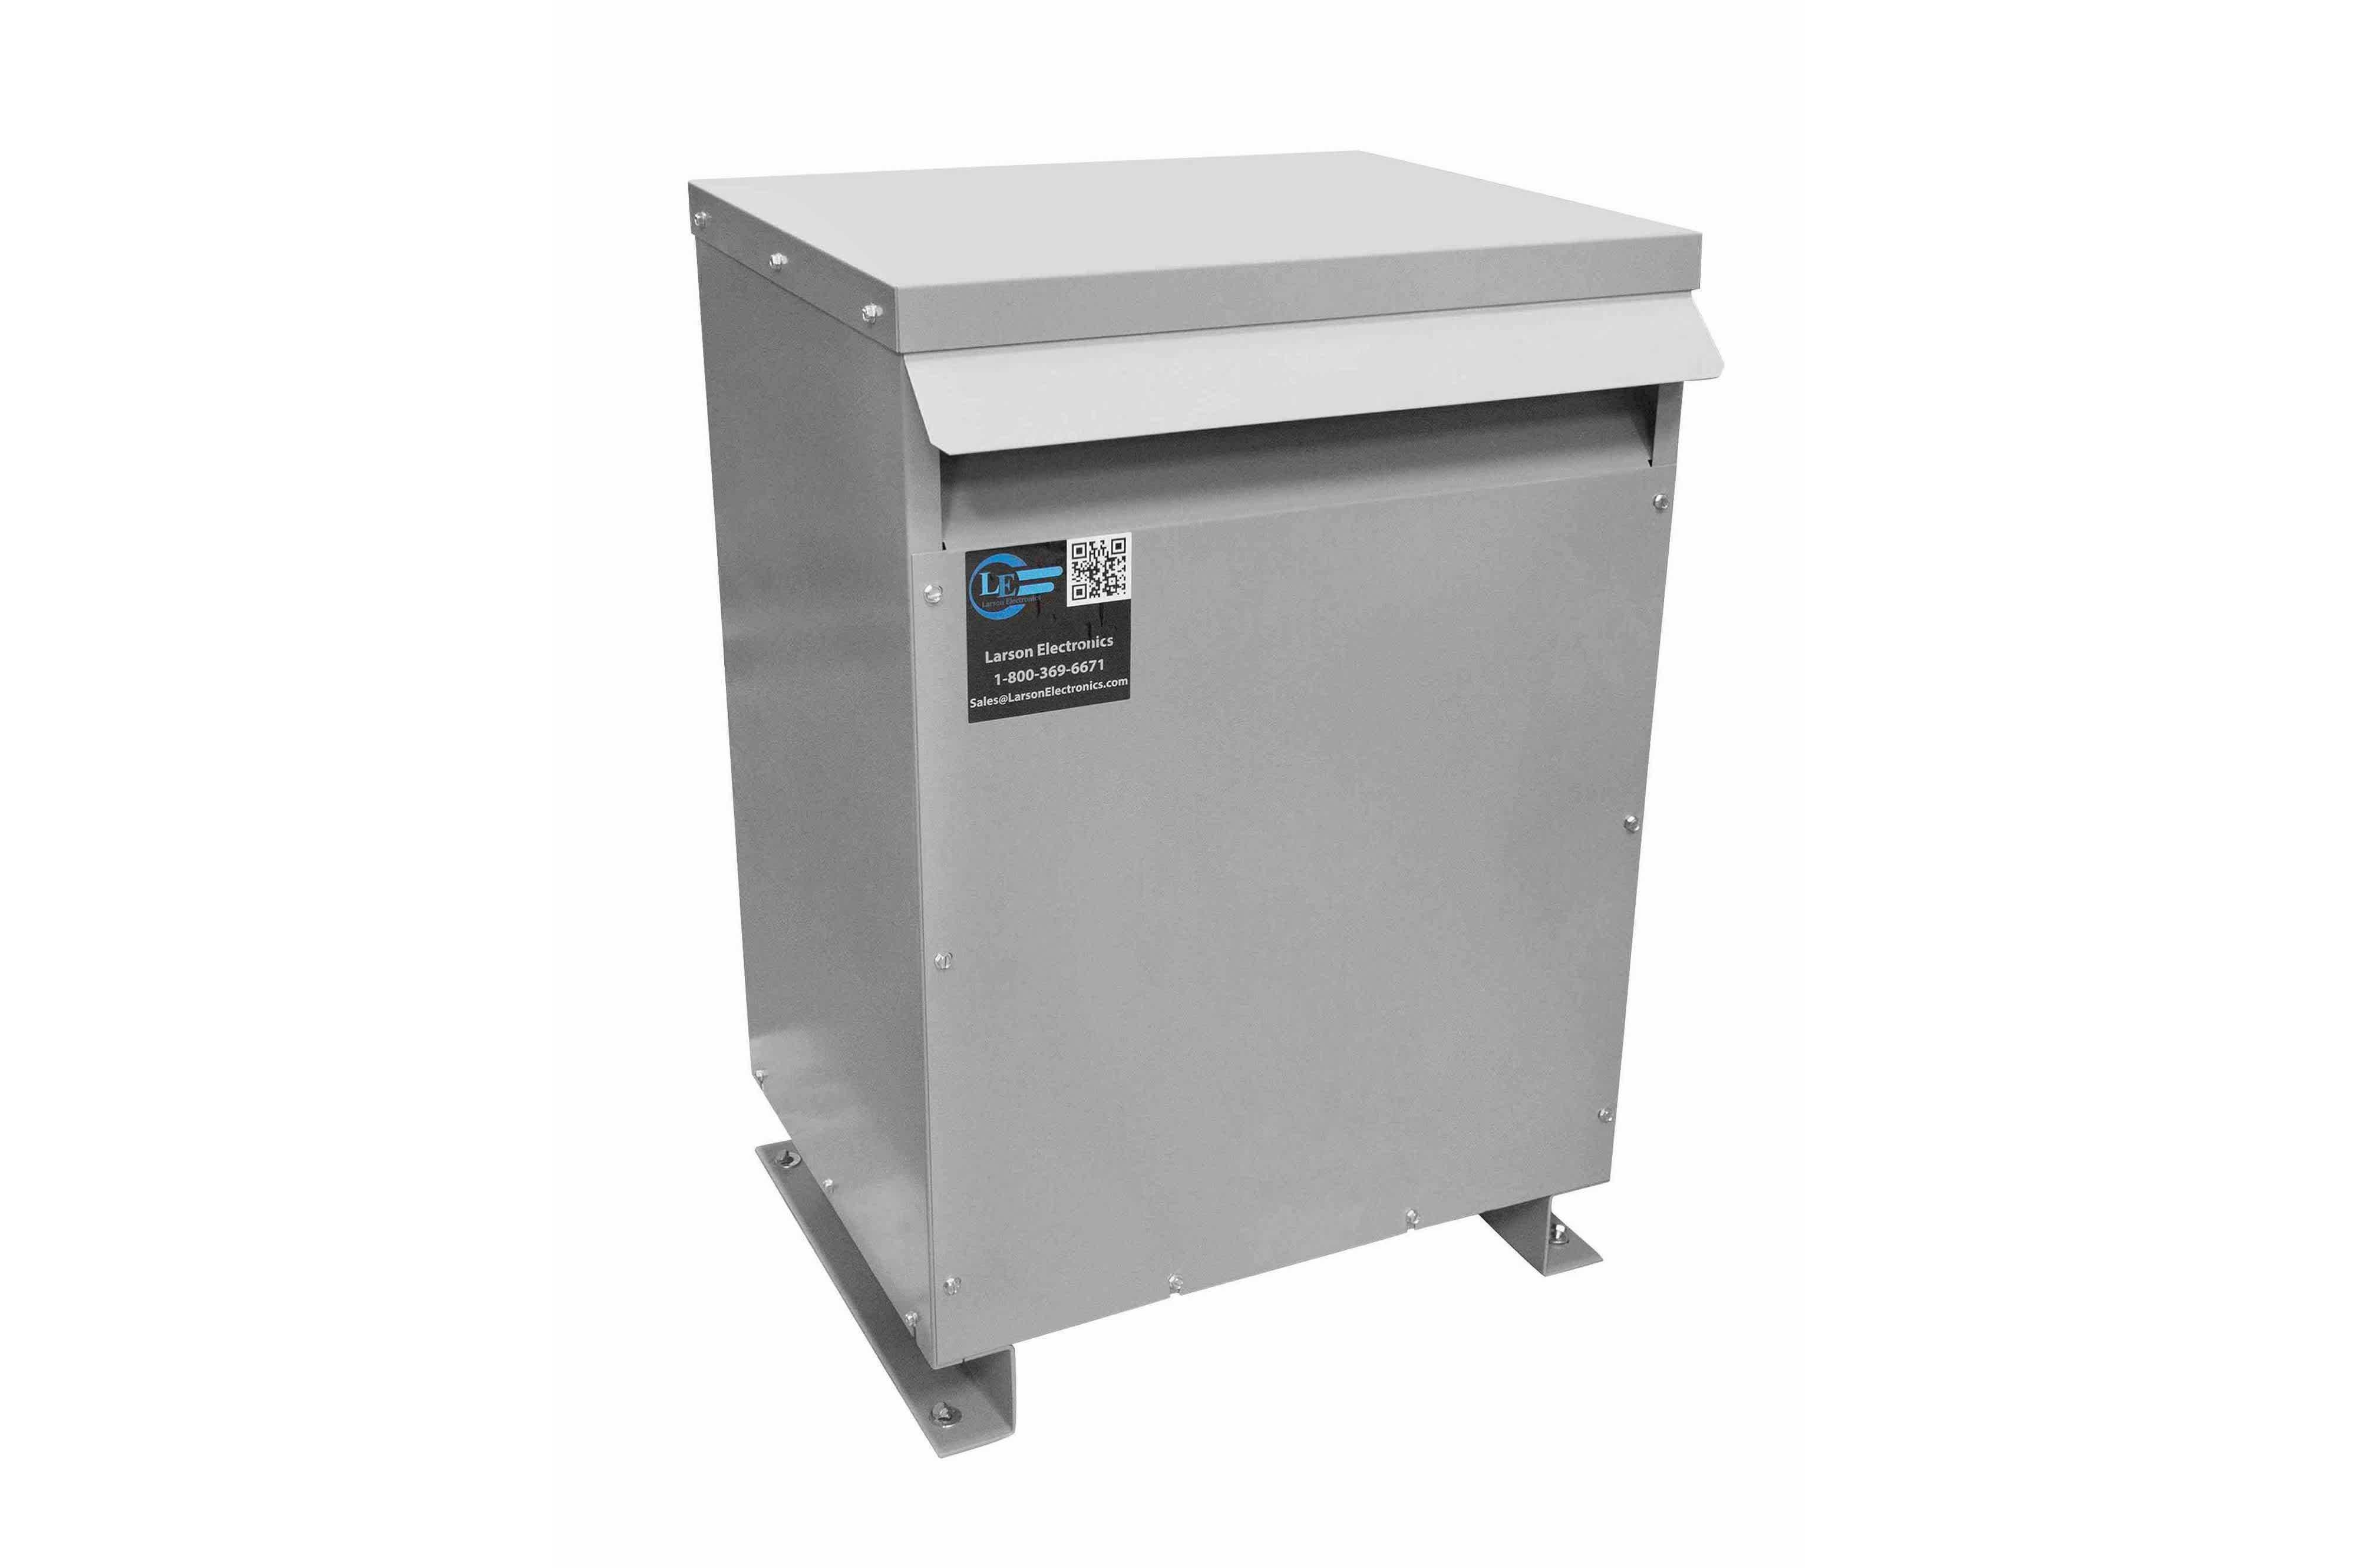 750 kVA 3PH Isolation Transformer, 575V Wye Primary, 208V Delta Secondary, N3R, Ventilated, 60 Hz